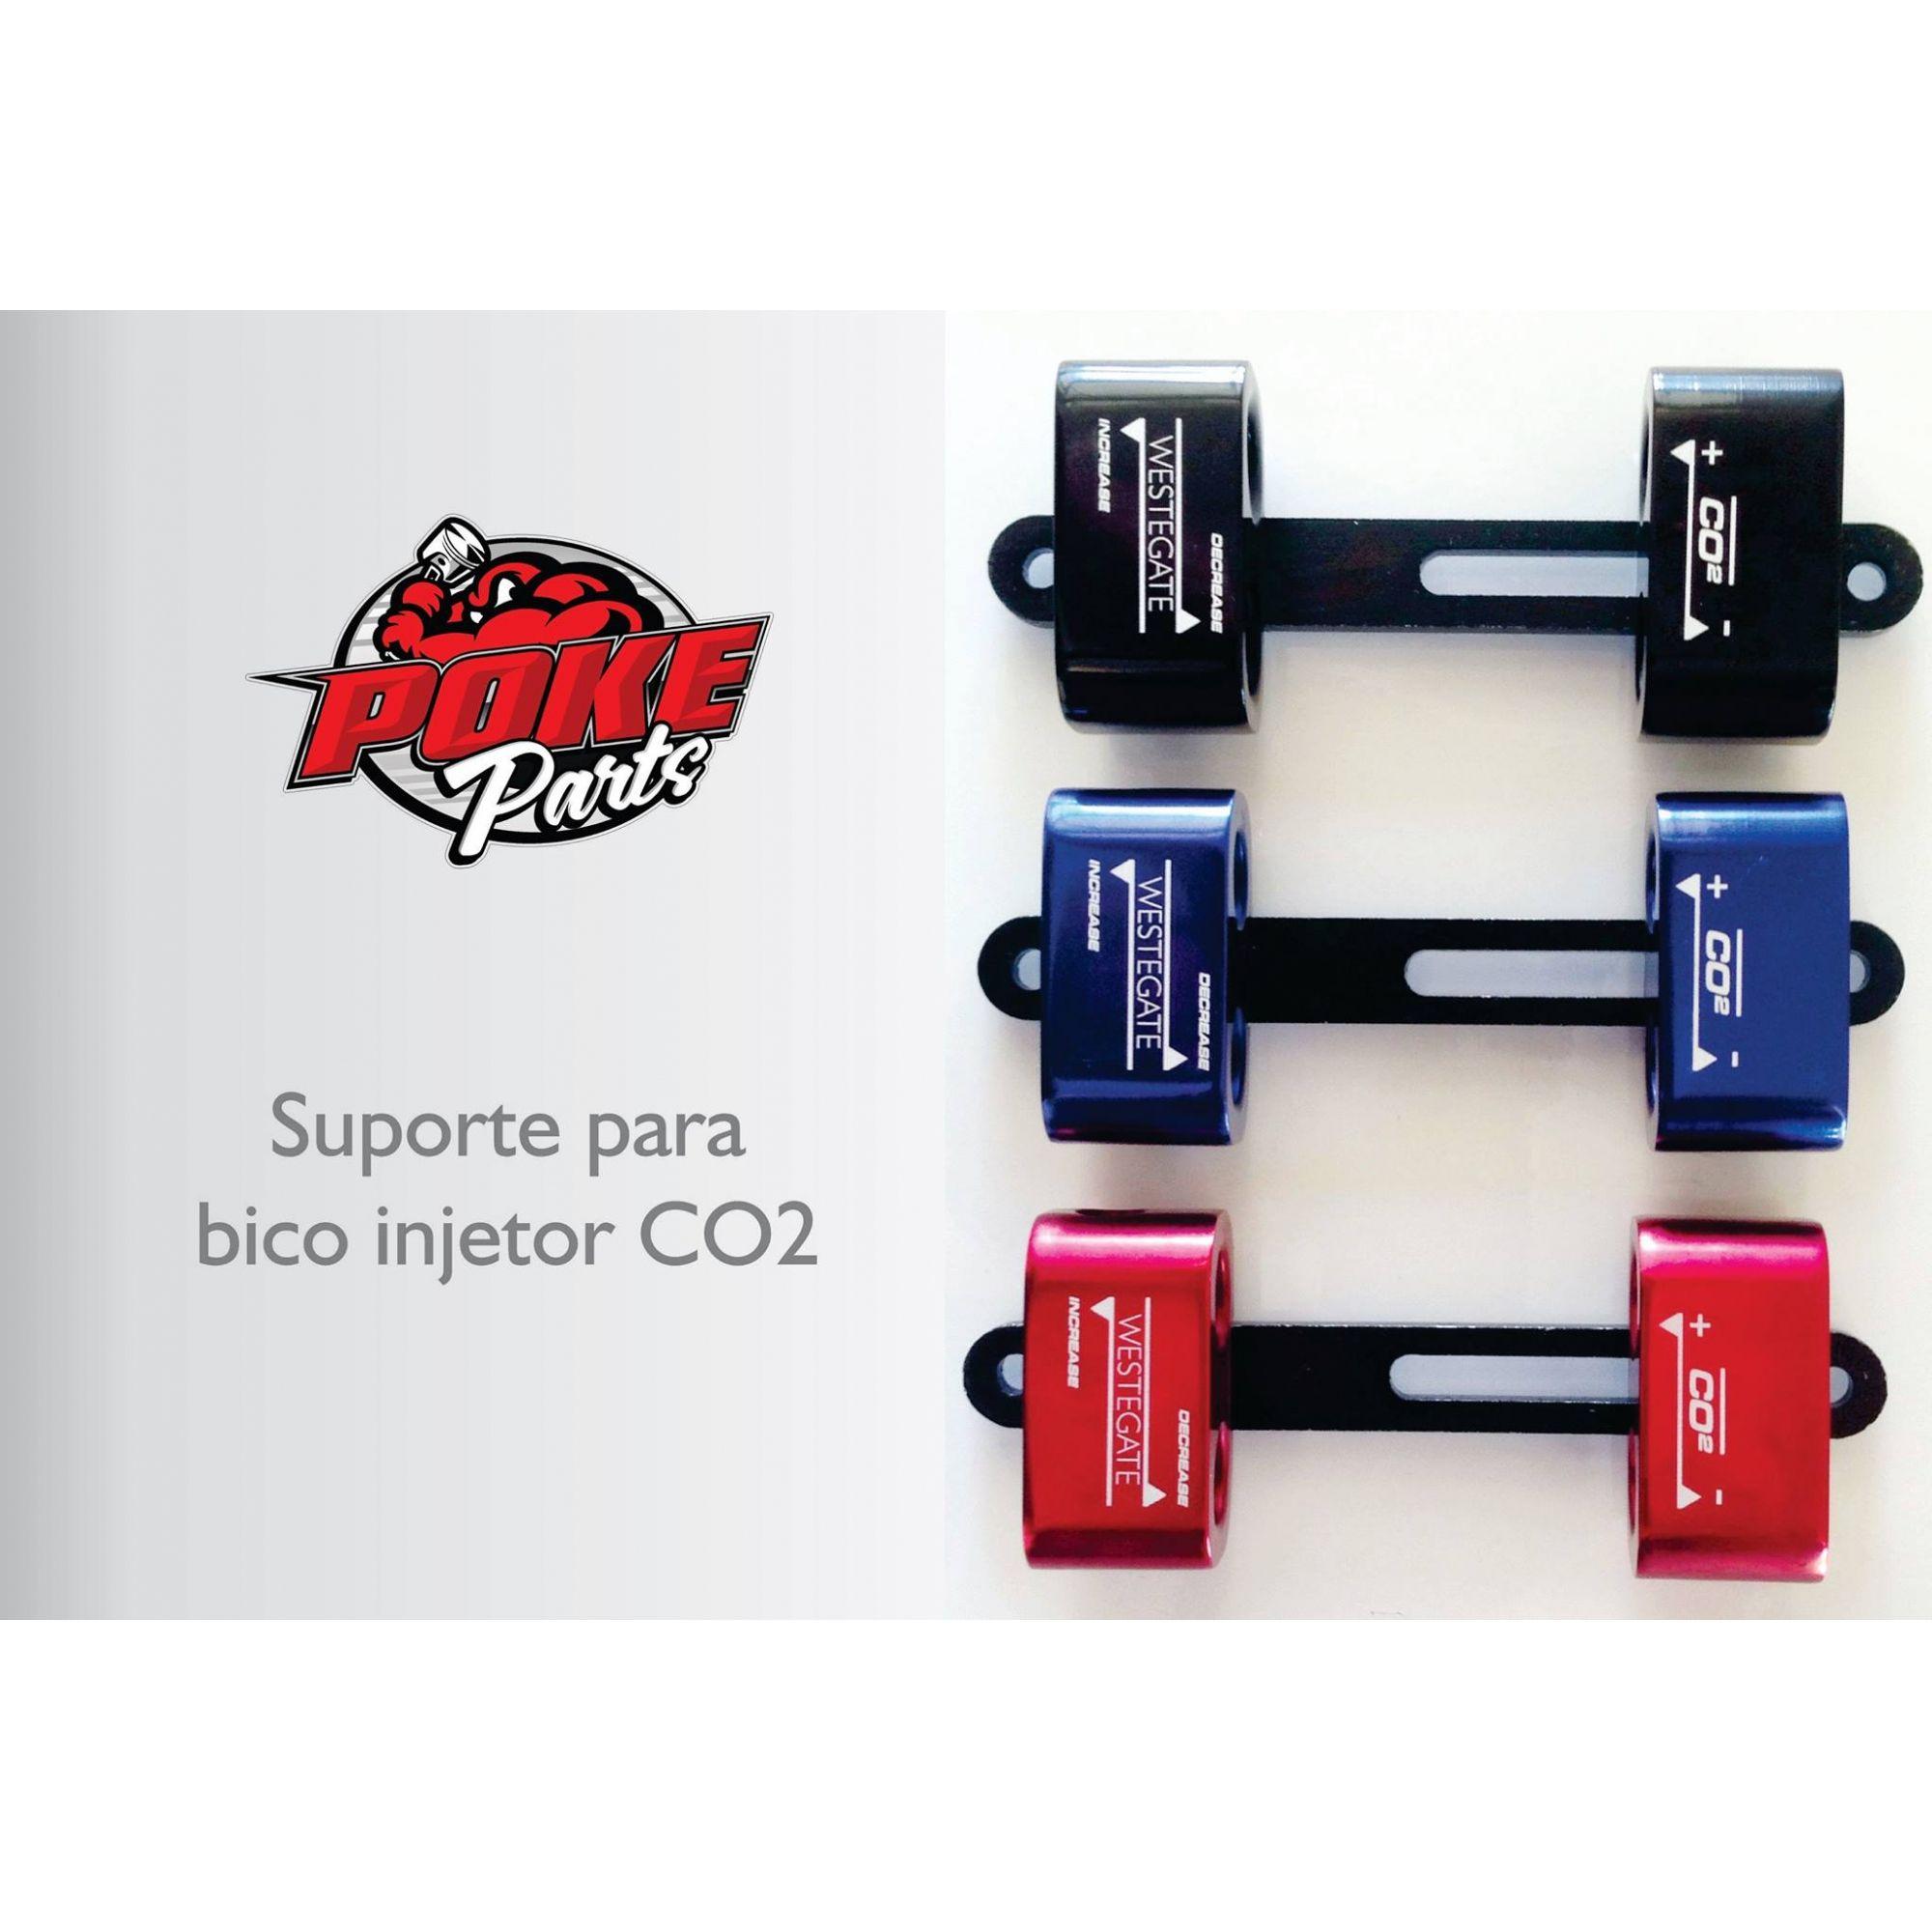 SUPORTE PARA BICO INJETOR CO2 - POKE